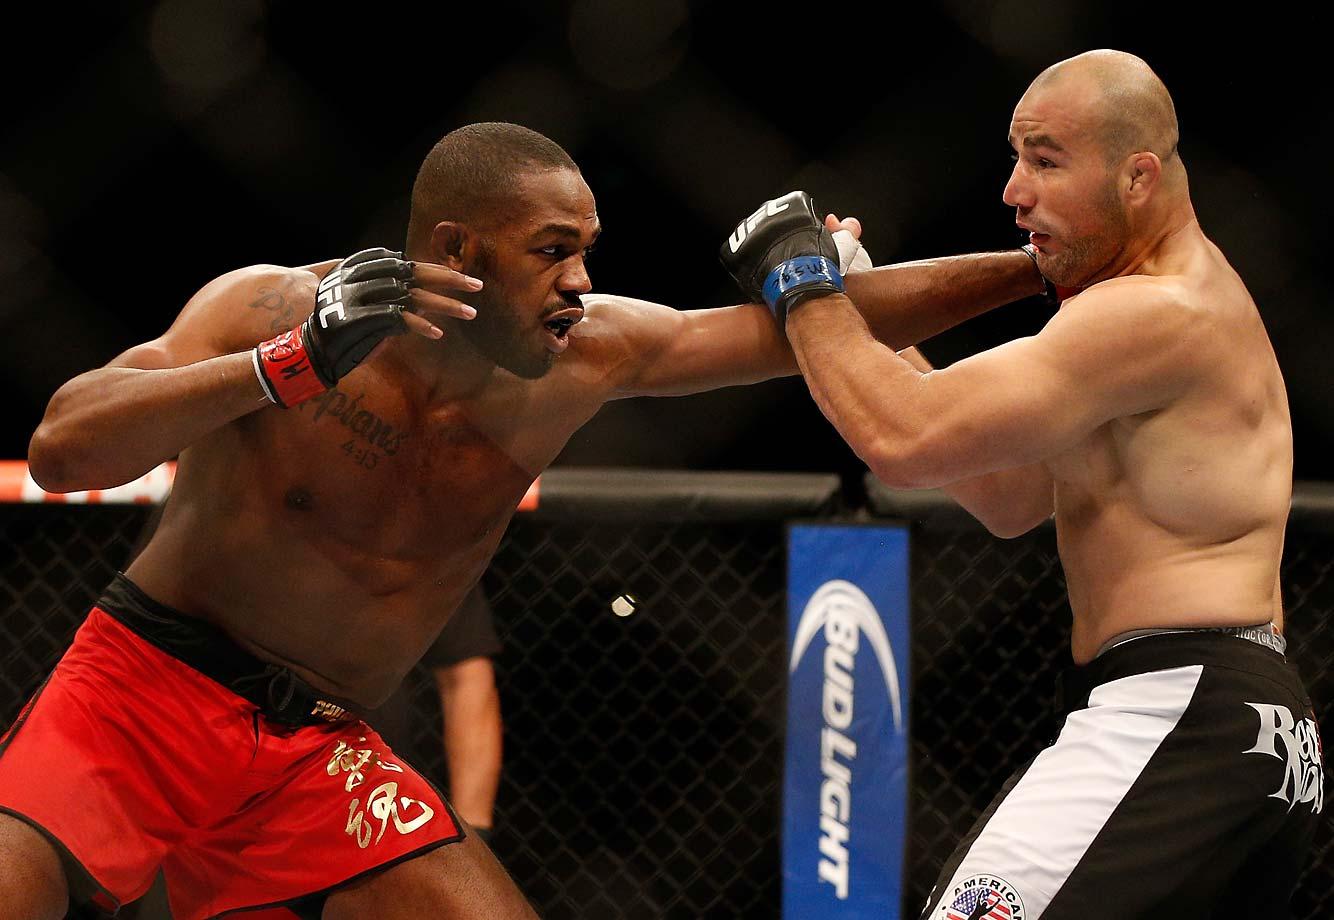 Jones tags Glover Teixeira with a straight left.